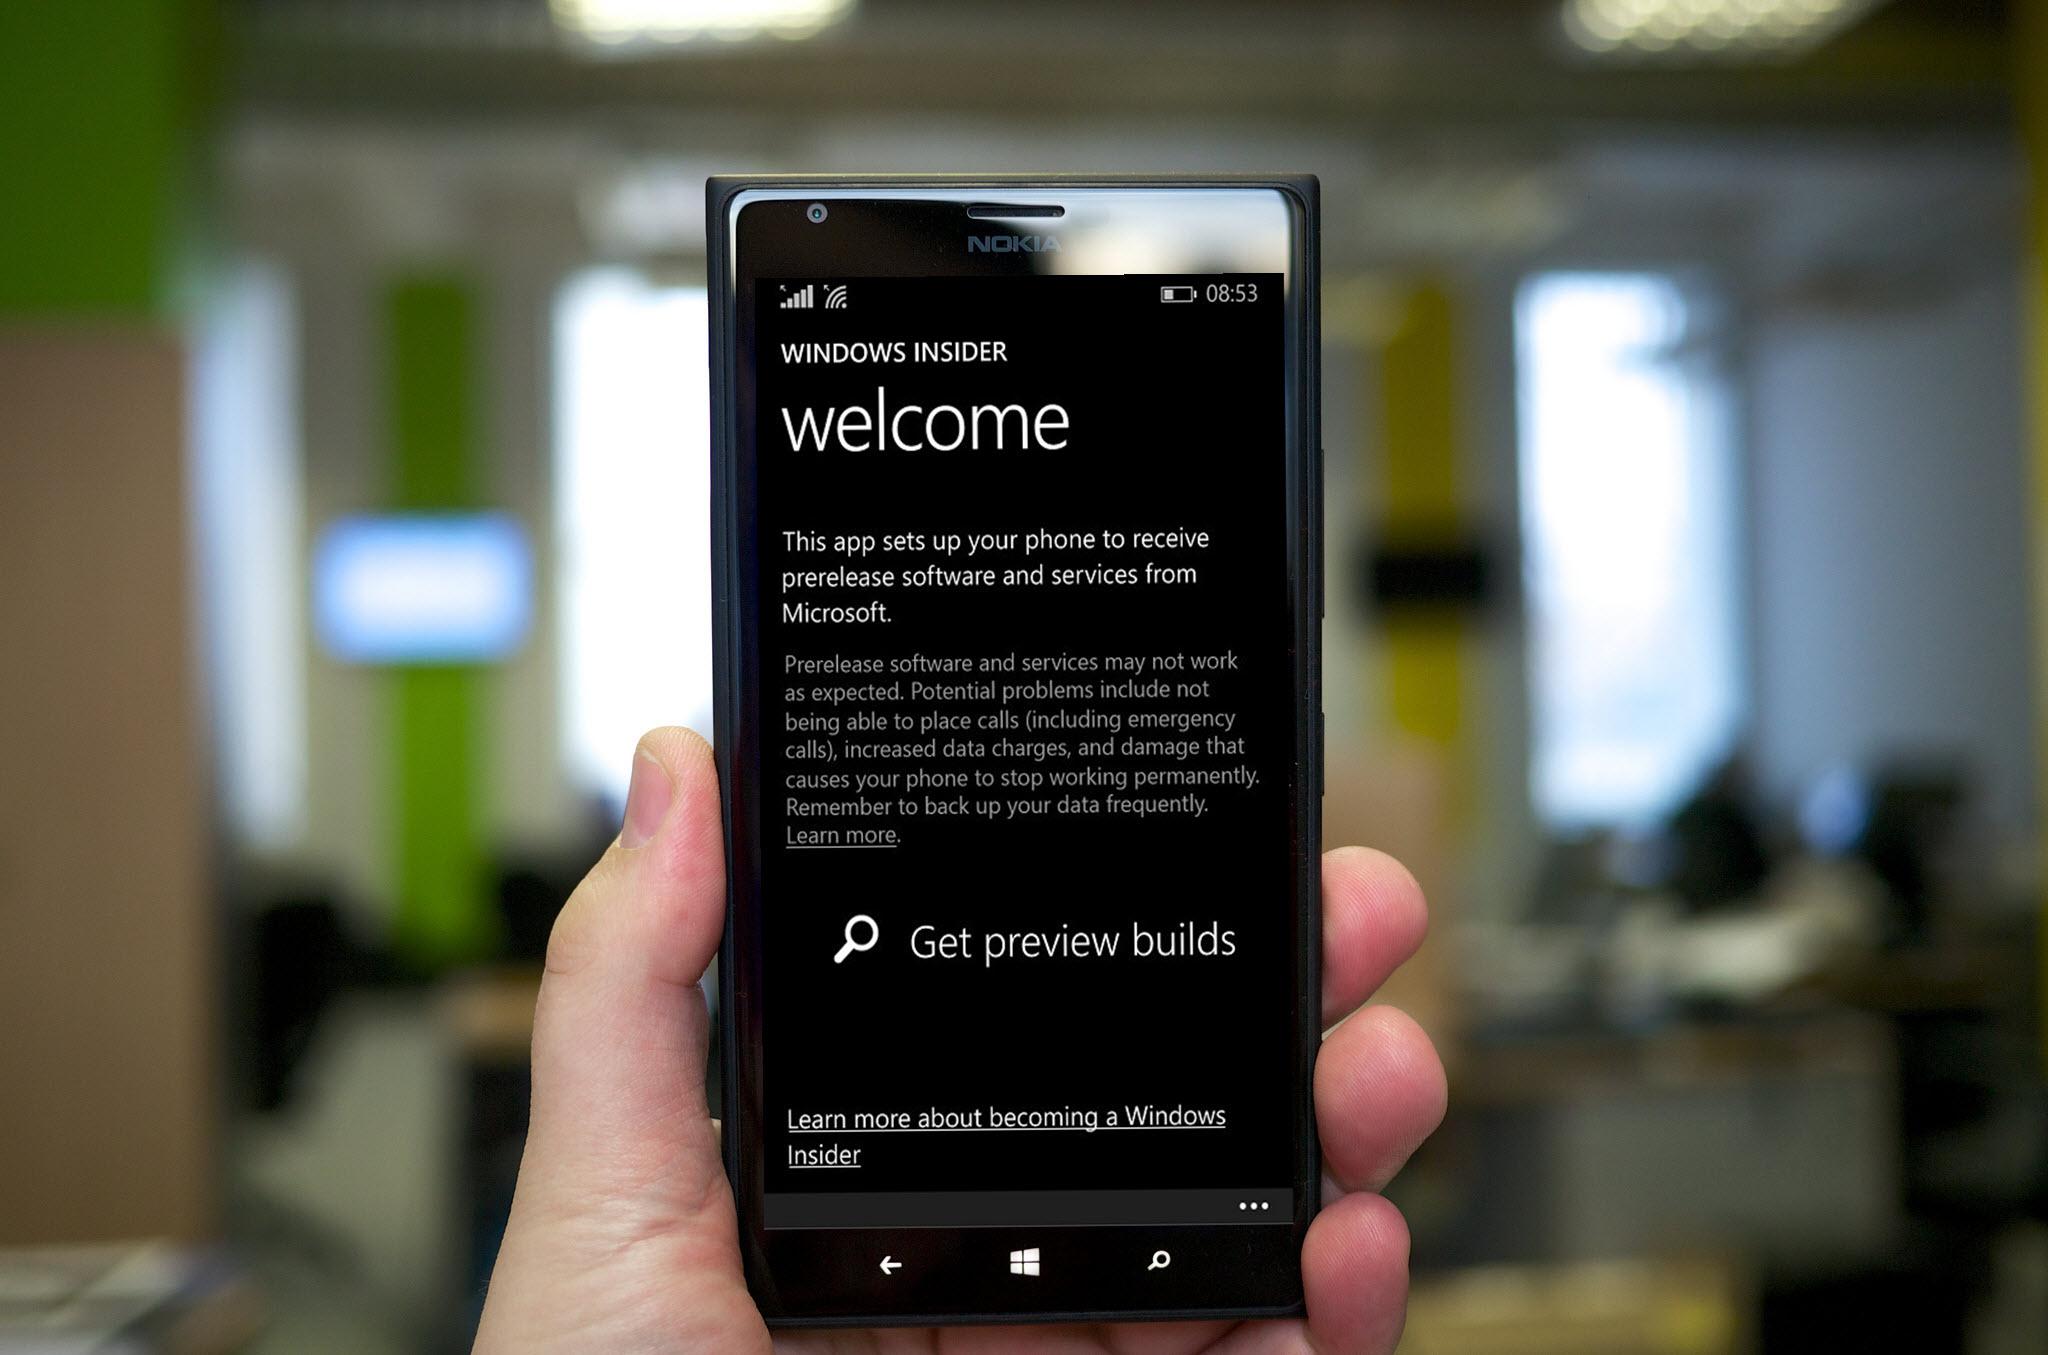 Windows Insider app own